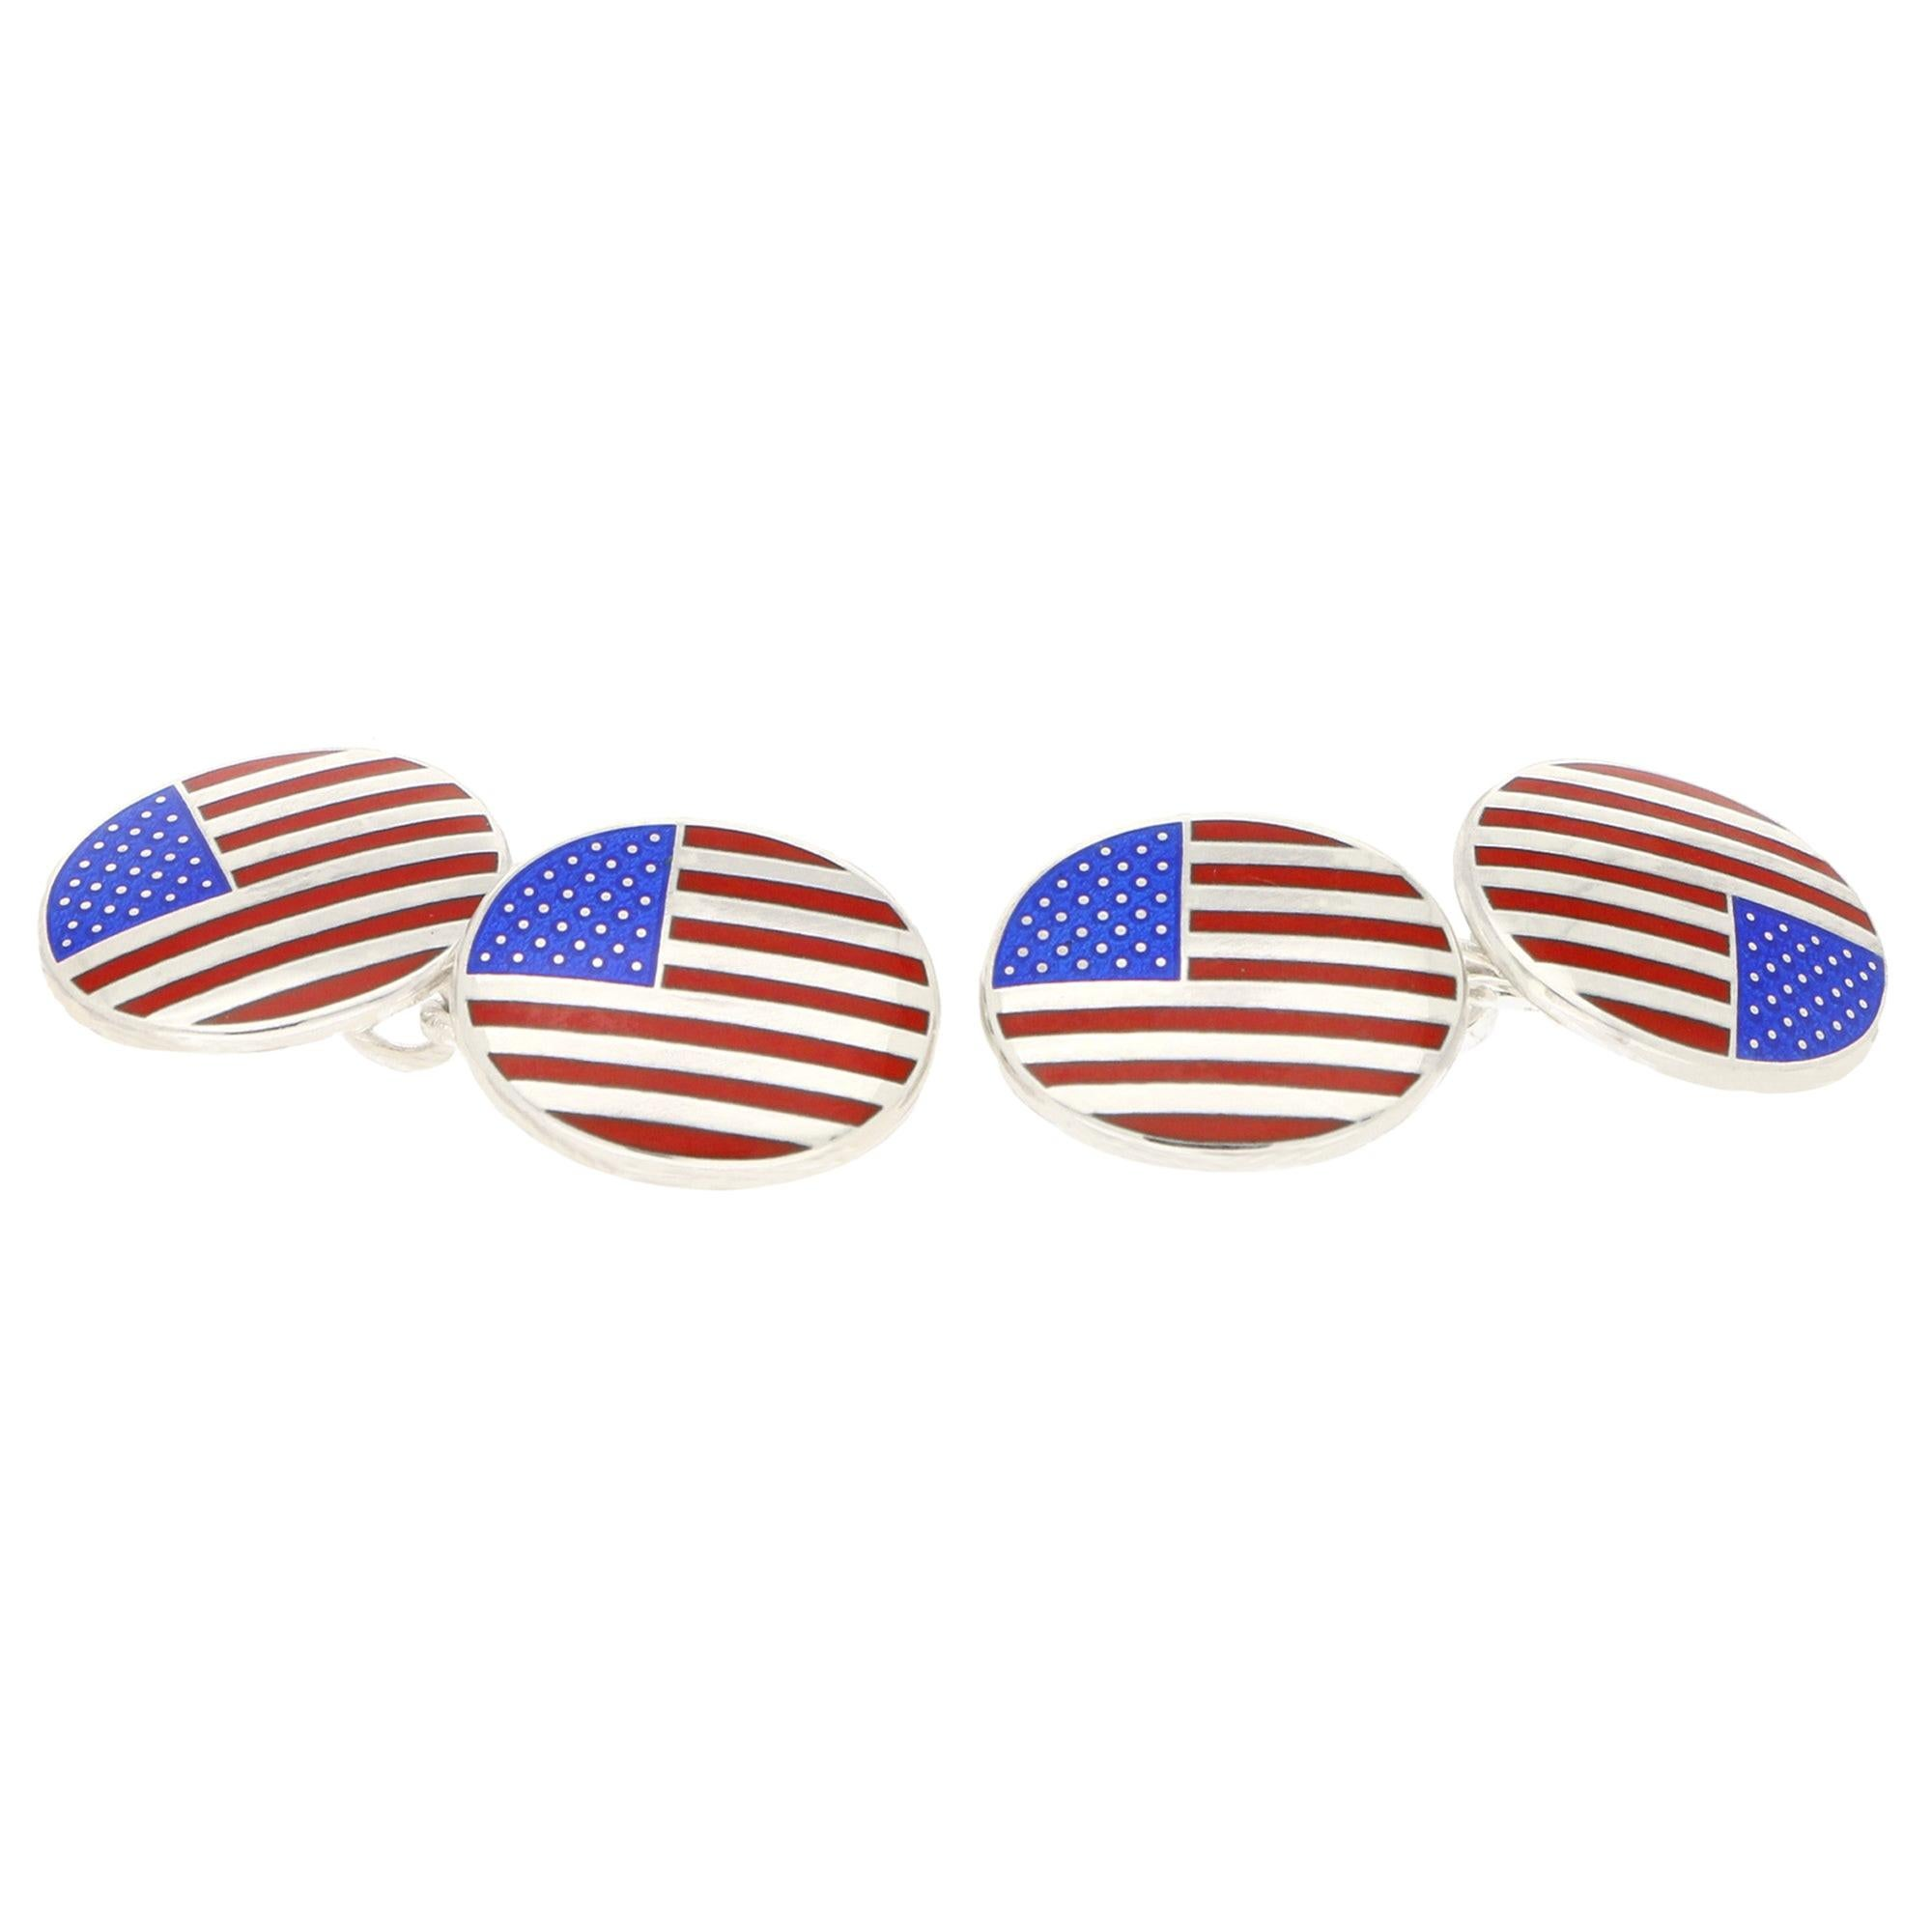 American Flag Enamel Chain Cufflinks Set in Sterling Silver